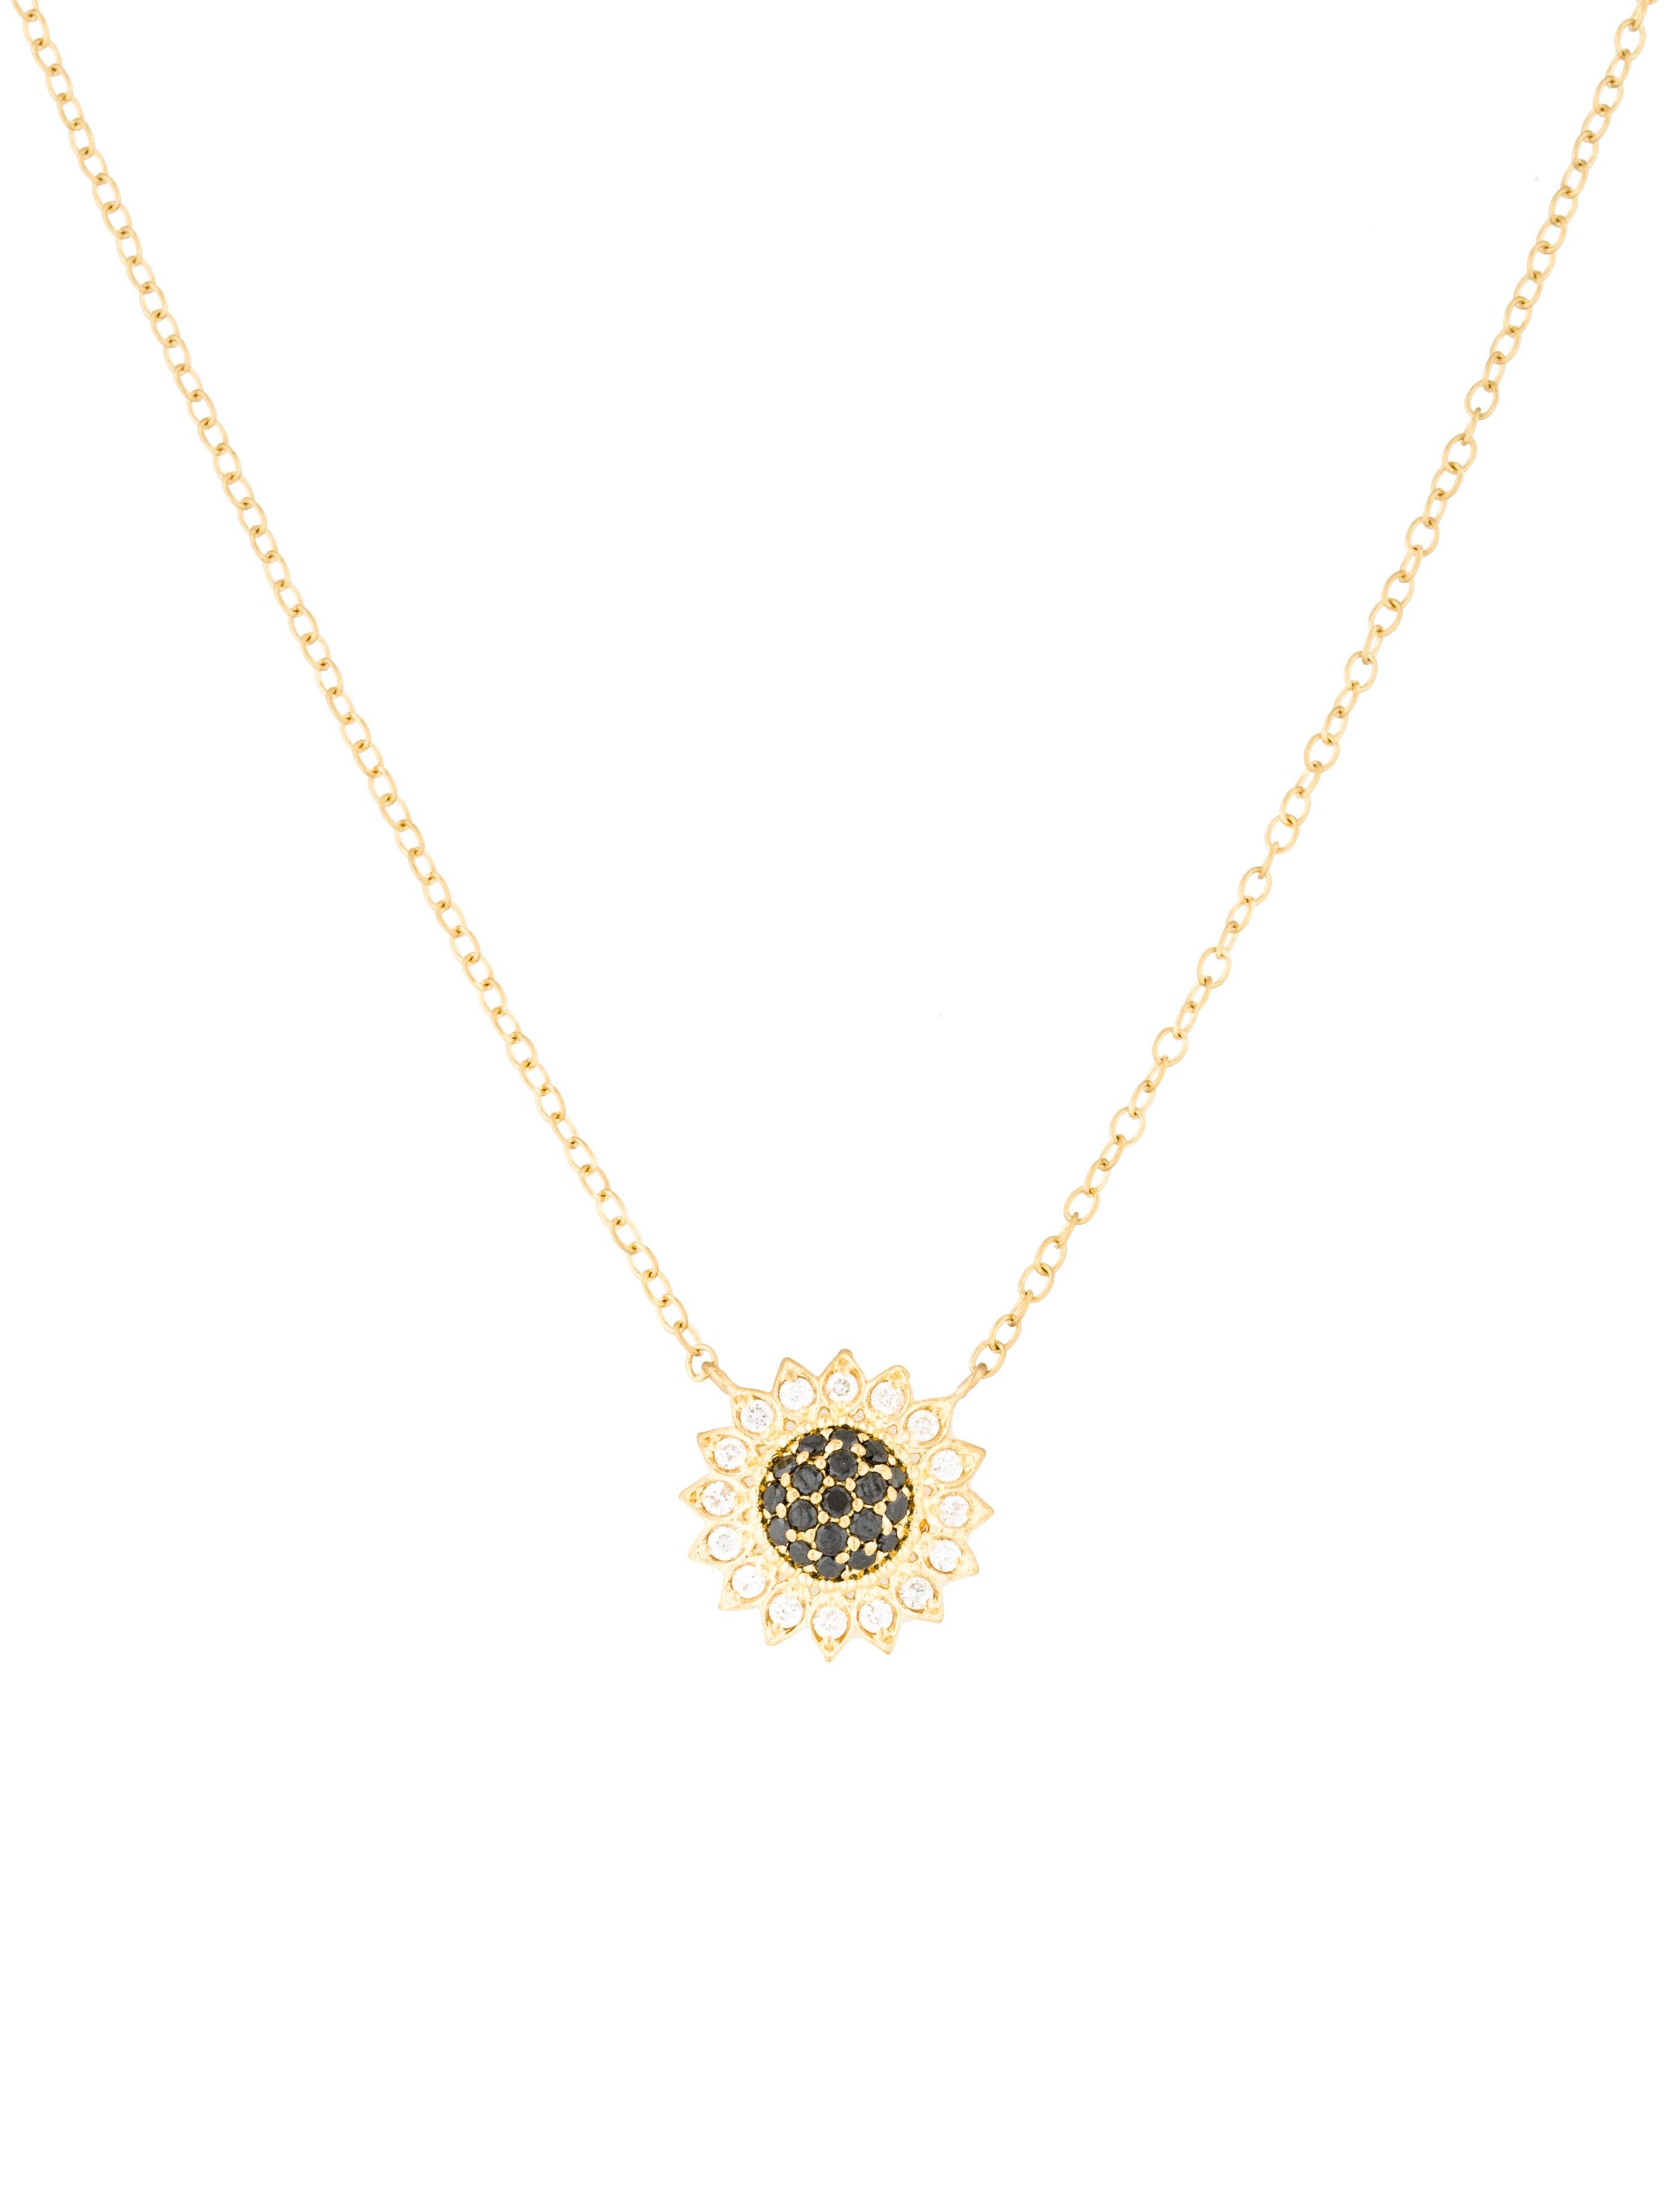 Jamie wolf 18k diamond sunflower pendant necklace necklaces 18k diamond sunflower pendant necklace aloadofball Gallery